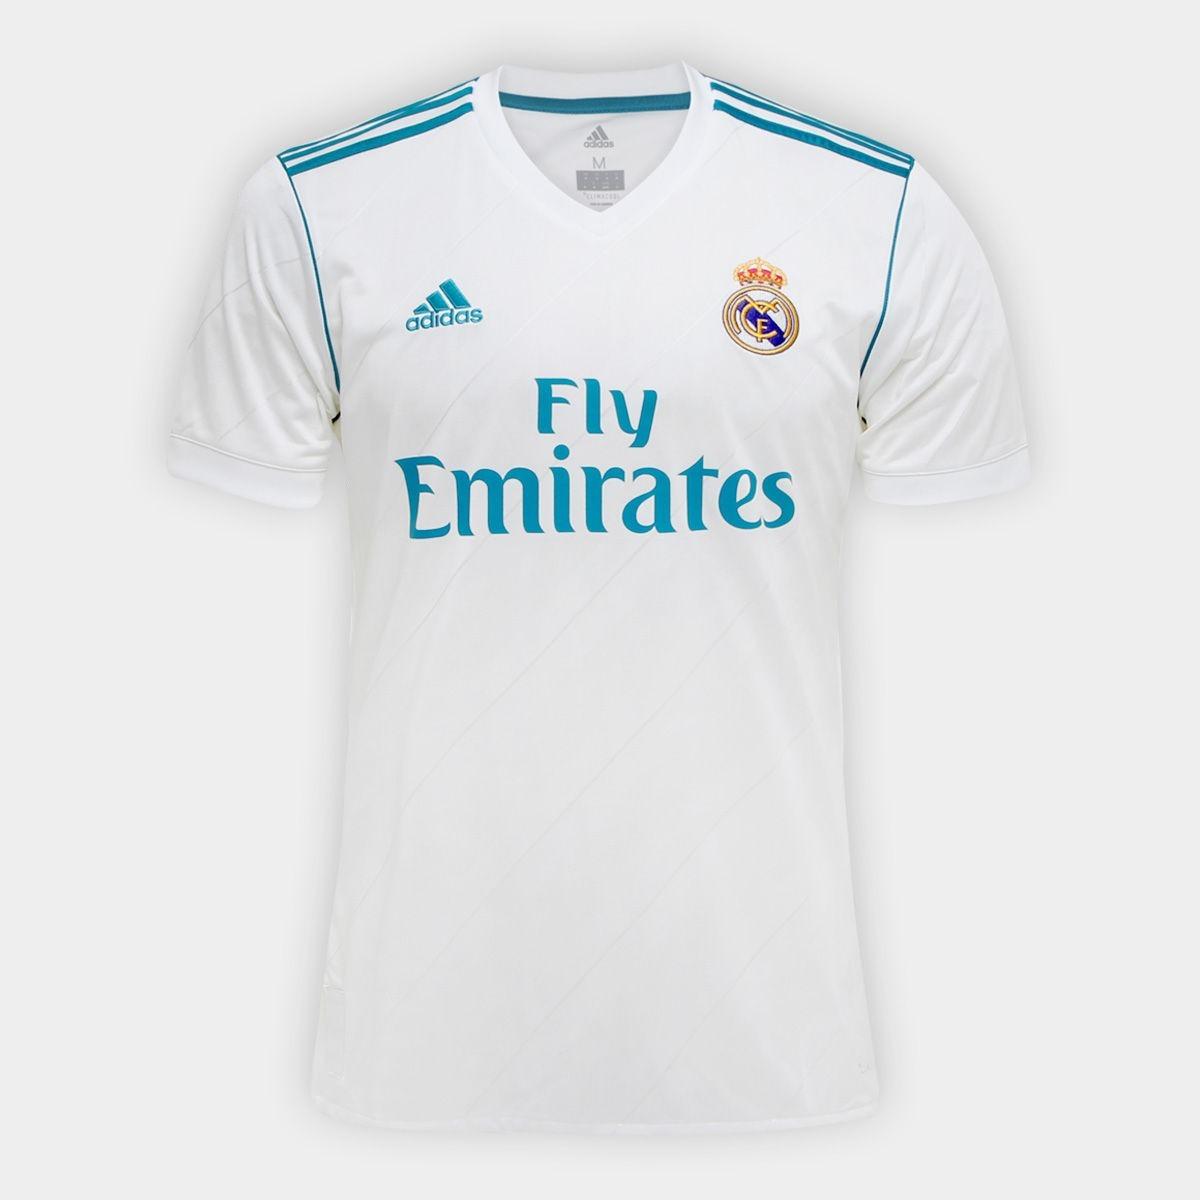 812d060206a7b camisa adidas real madrid home 2018 - branco e azul turquesa. Carregando  zoom.